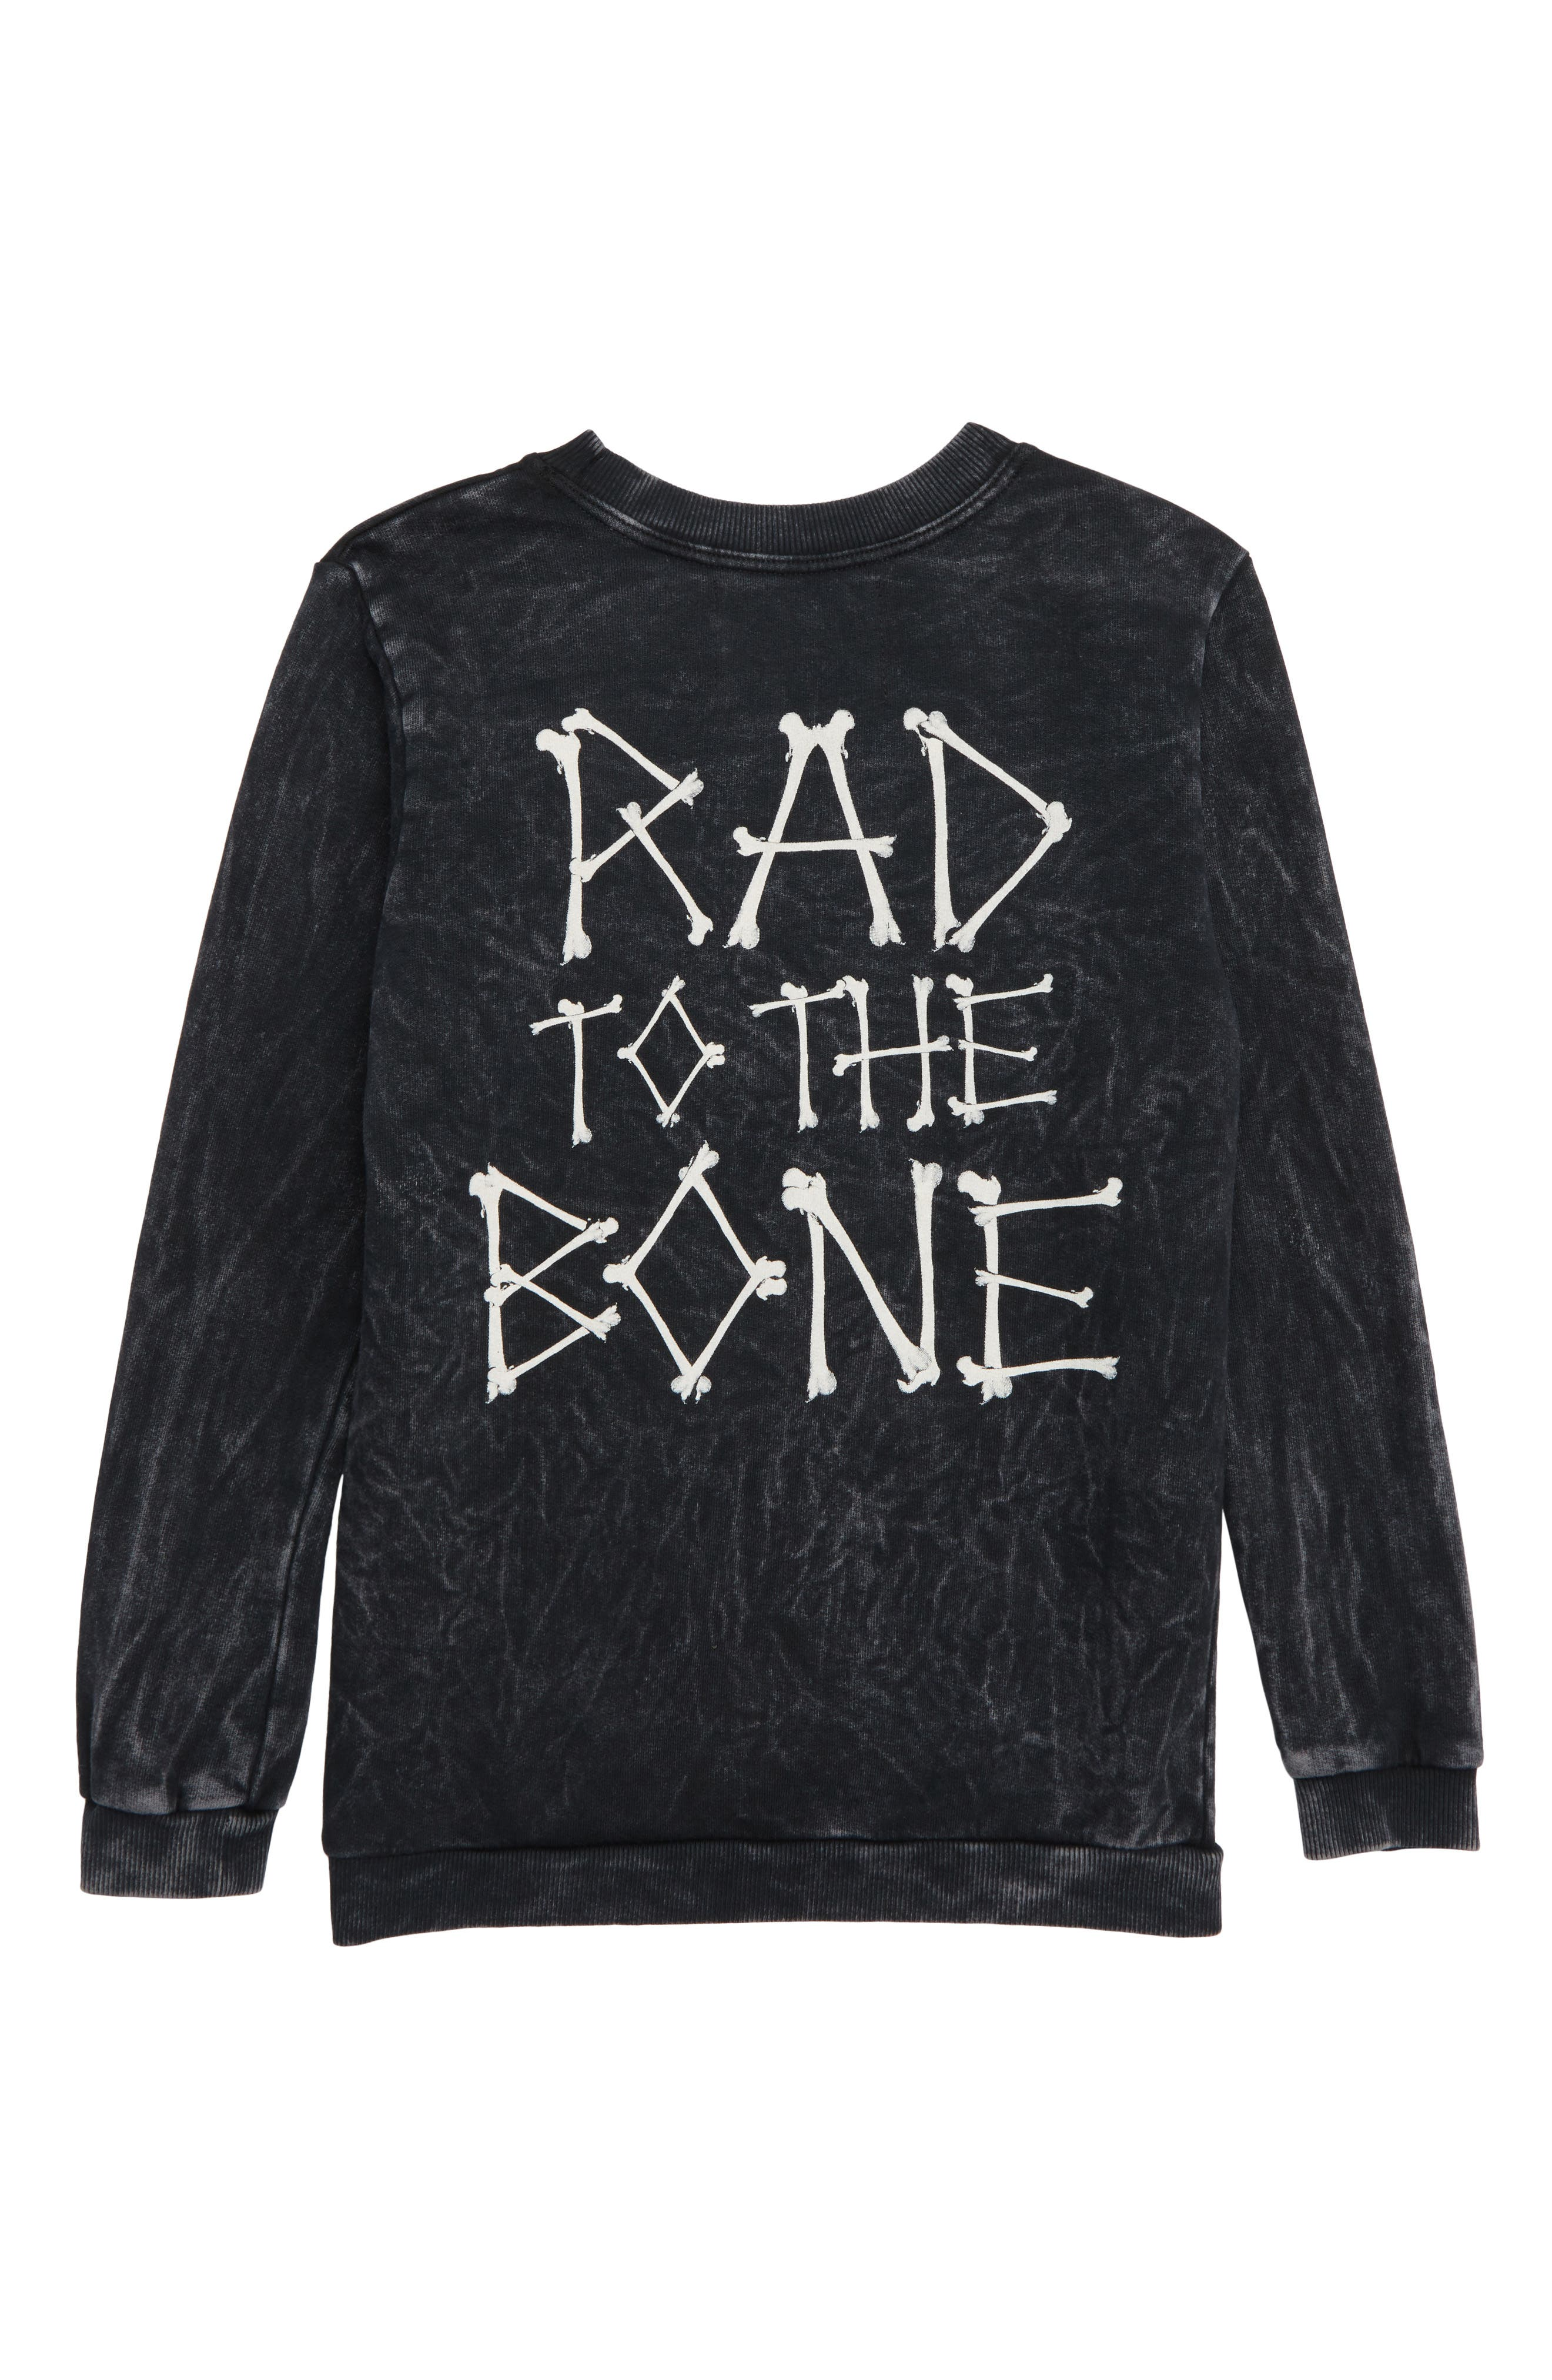 Rad to the Bone Sweatshirt,                             Alternate thumbnail 2, color,                             MINERAL BLACK